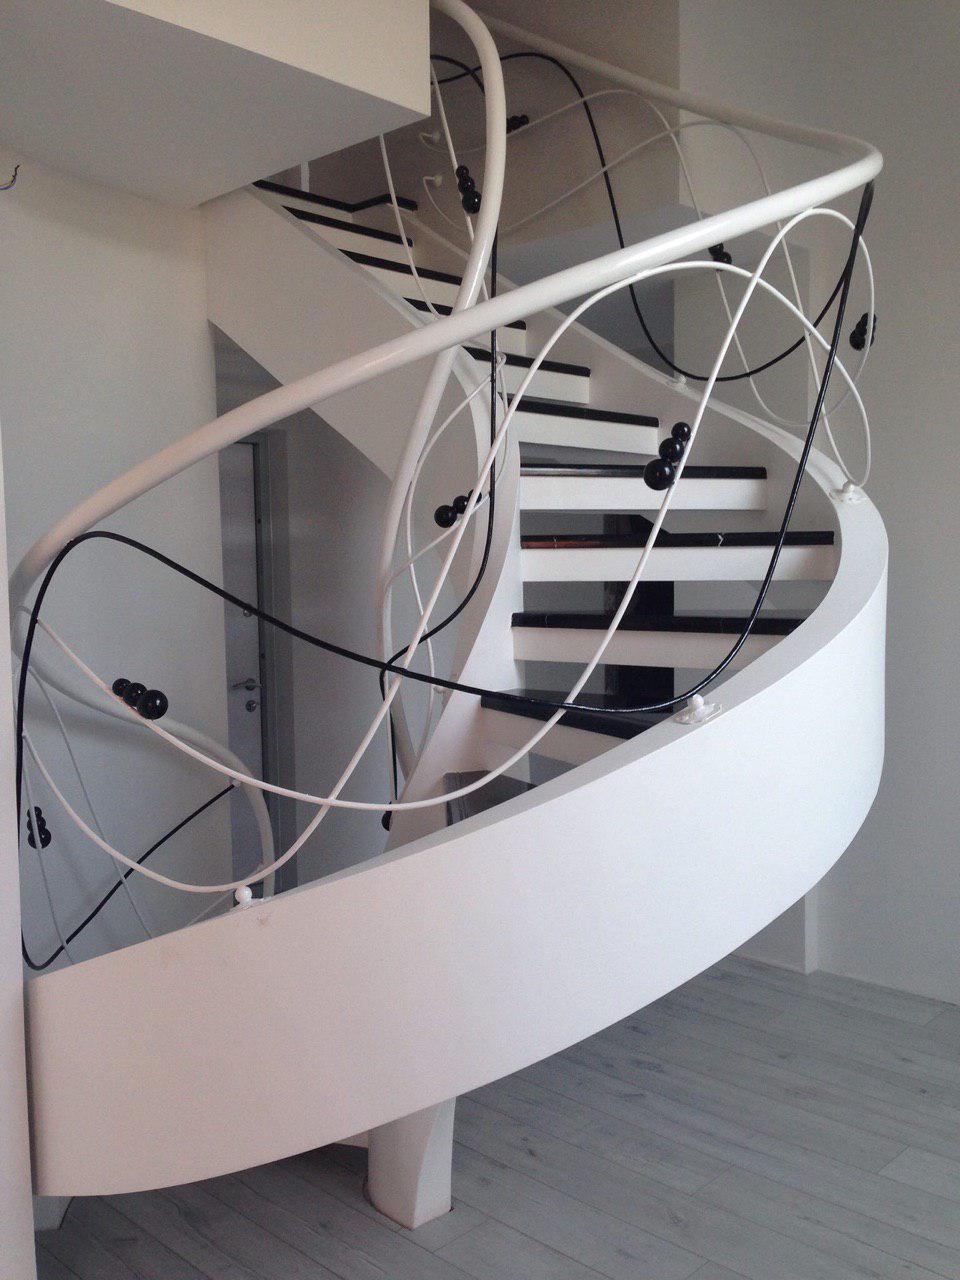 Полувинтовая двухтетивная лестница